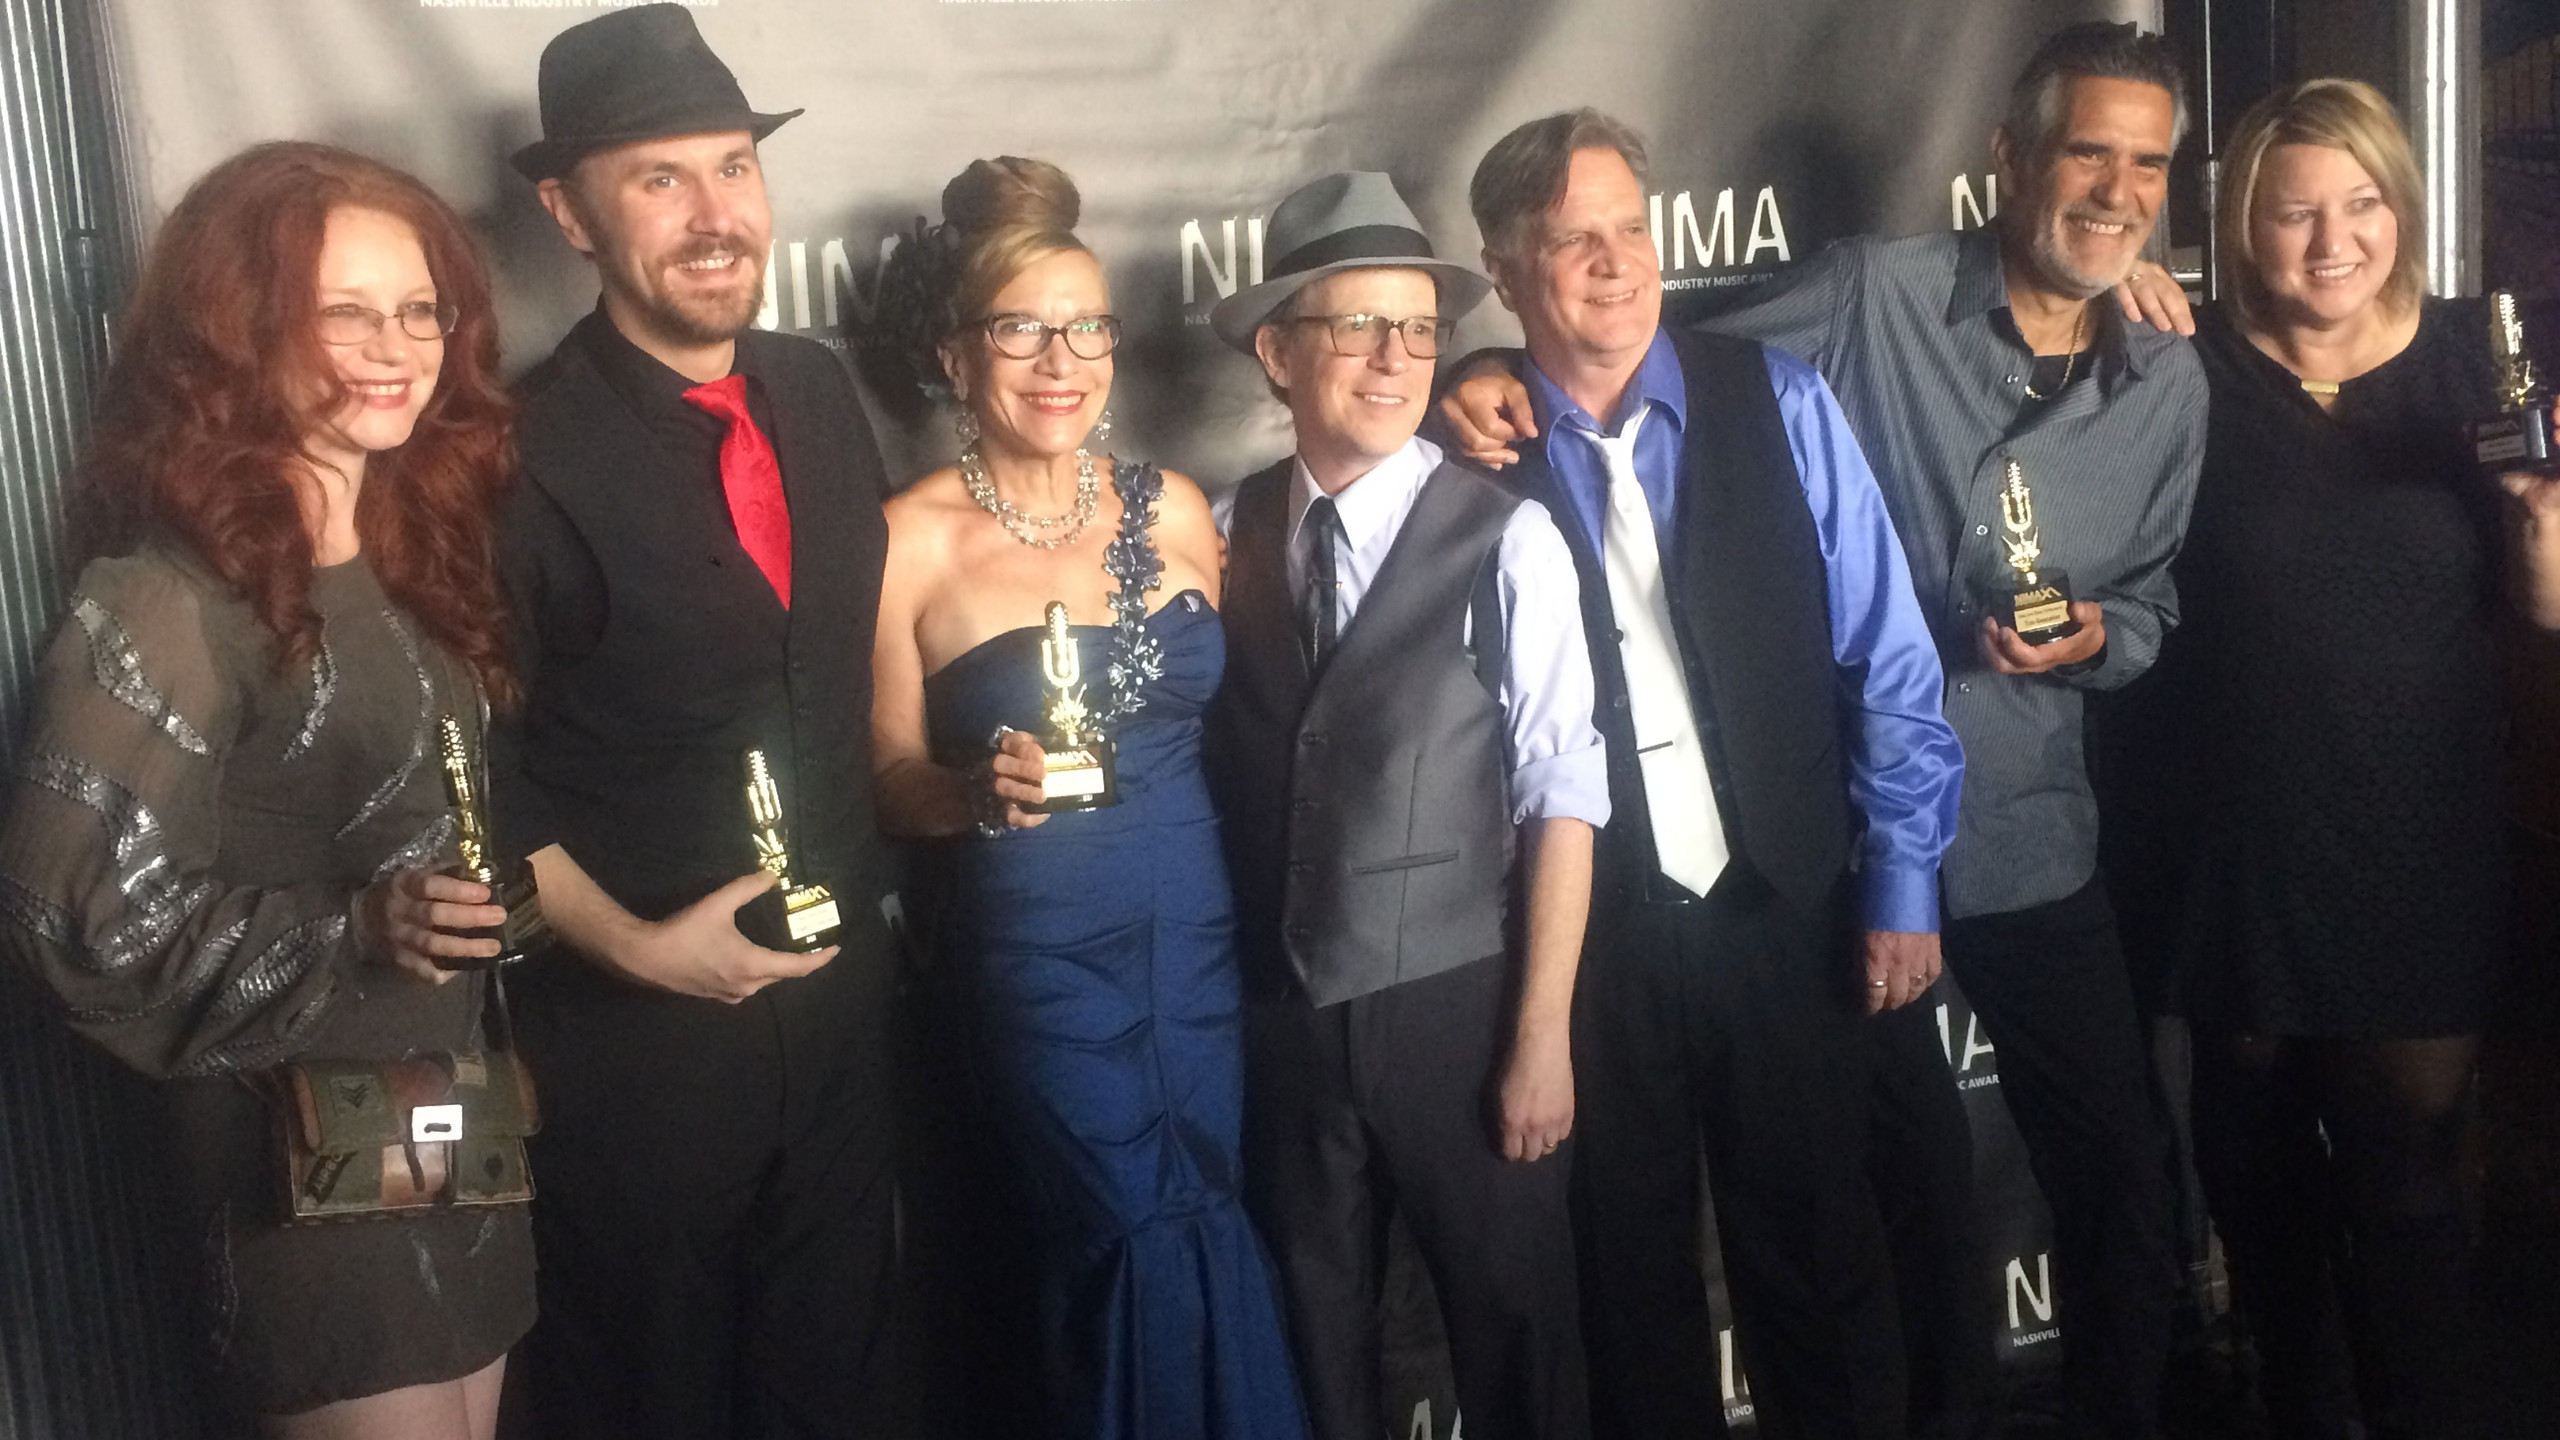 NIMA Nashville Industry Music Awards